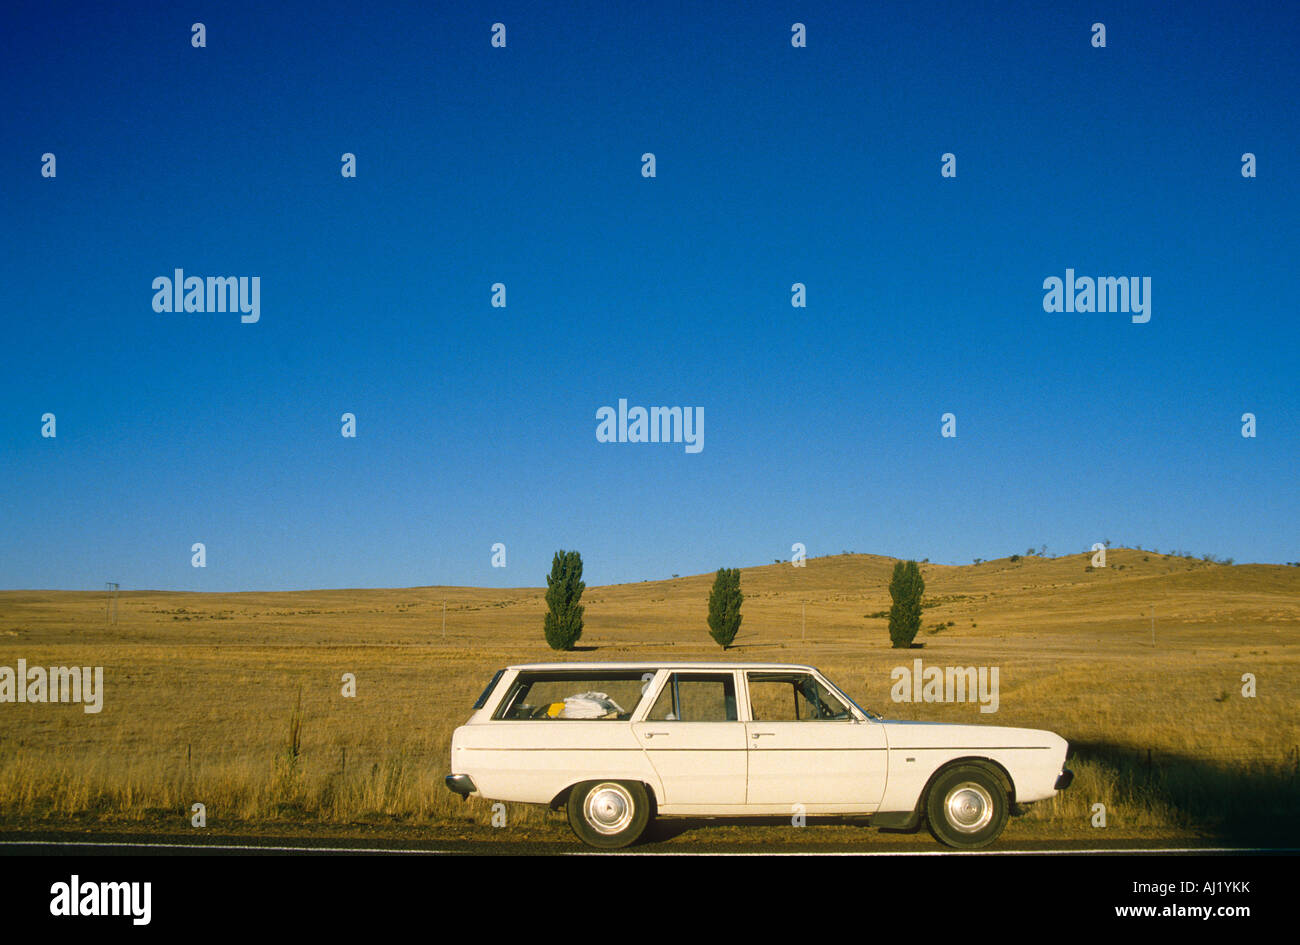 1973 Valiant station wagon Stock Photo: 14594838 - Alamy